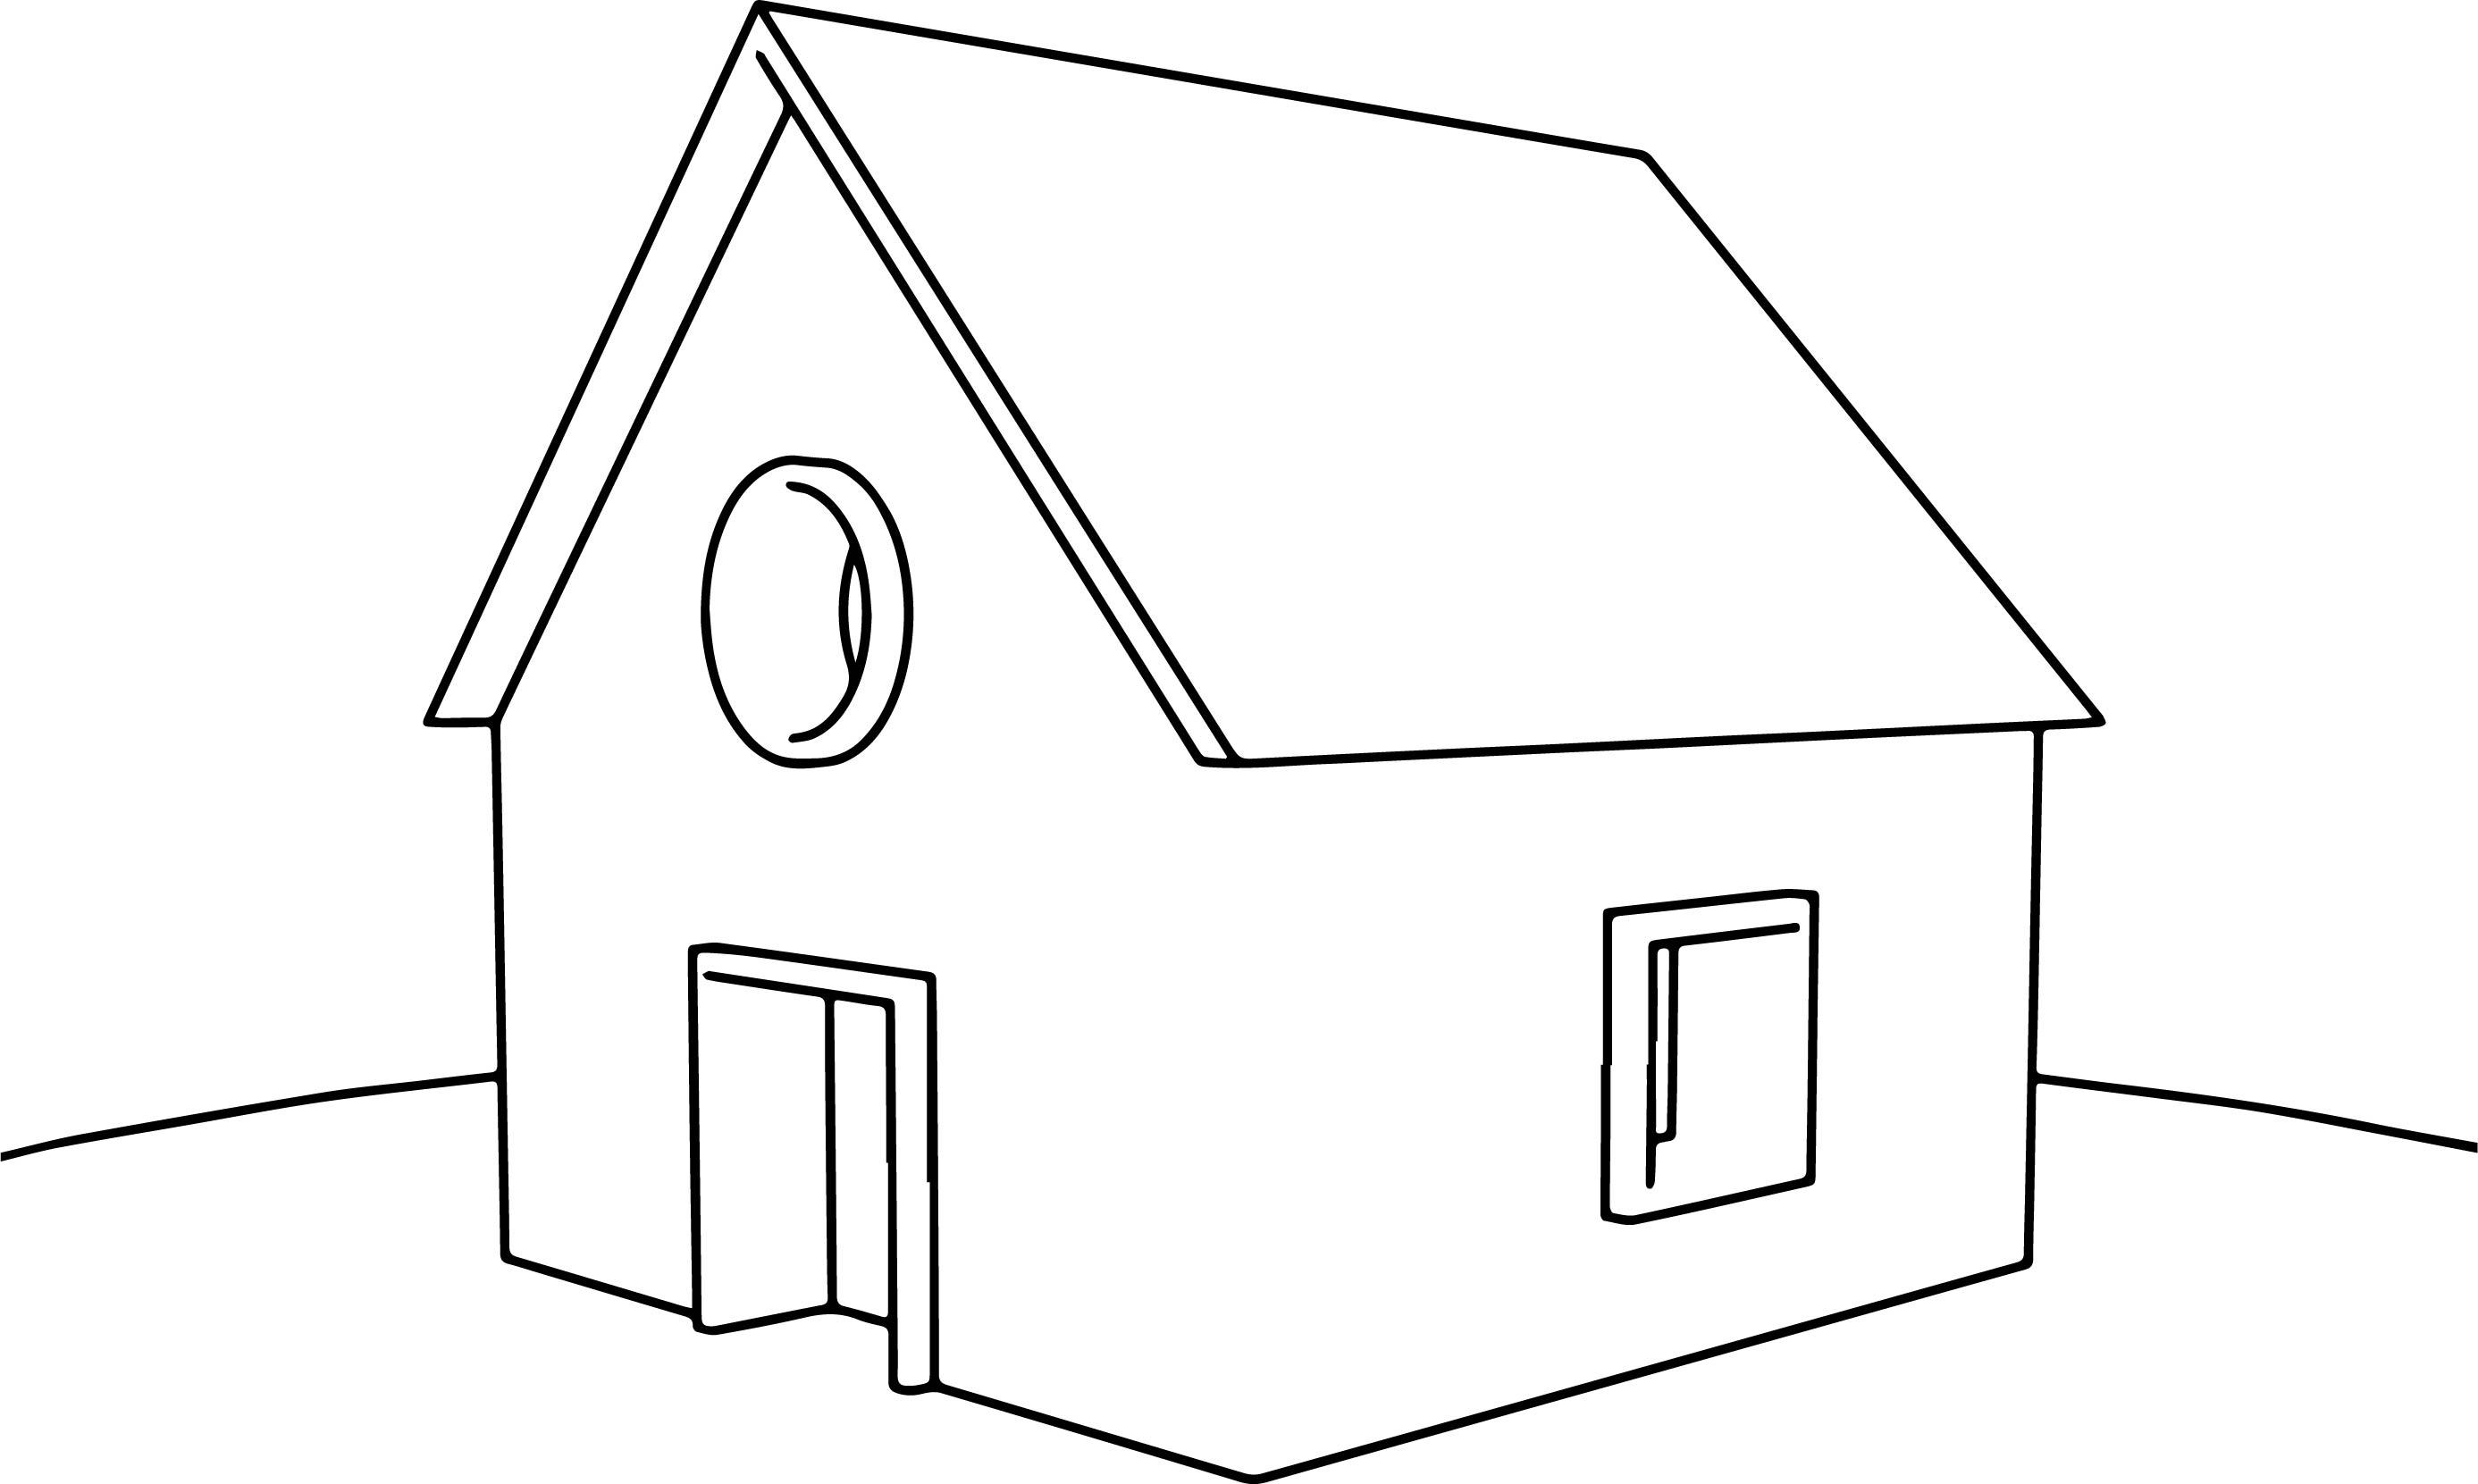 Casa Cartoon House Coloring Page   Wecoloringpage